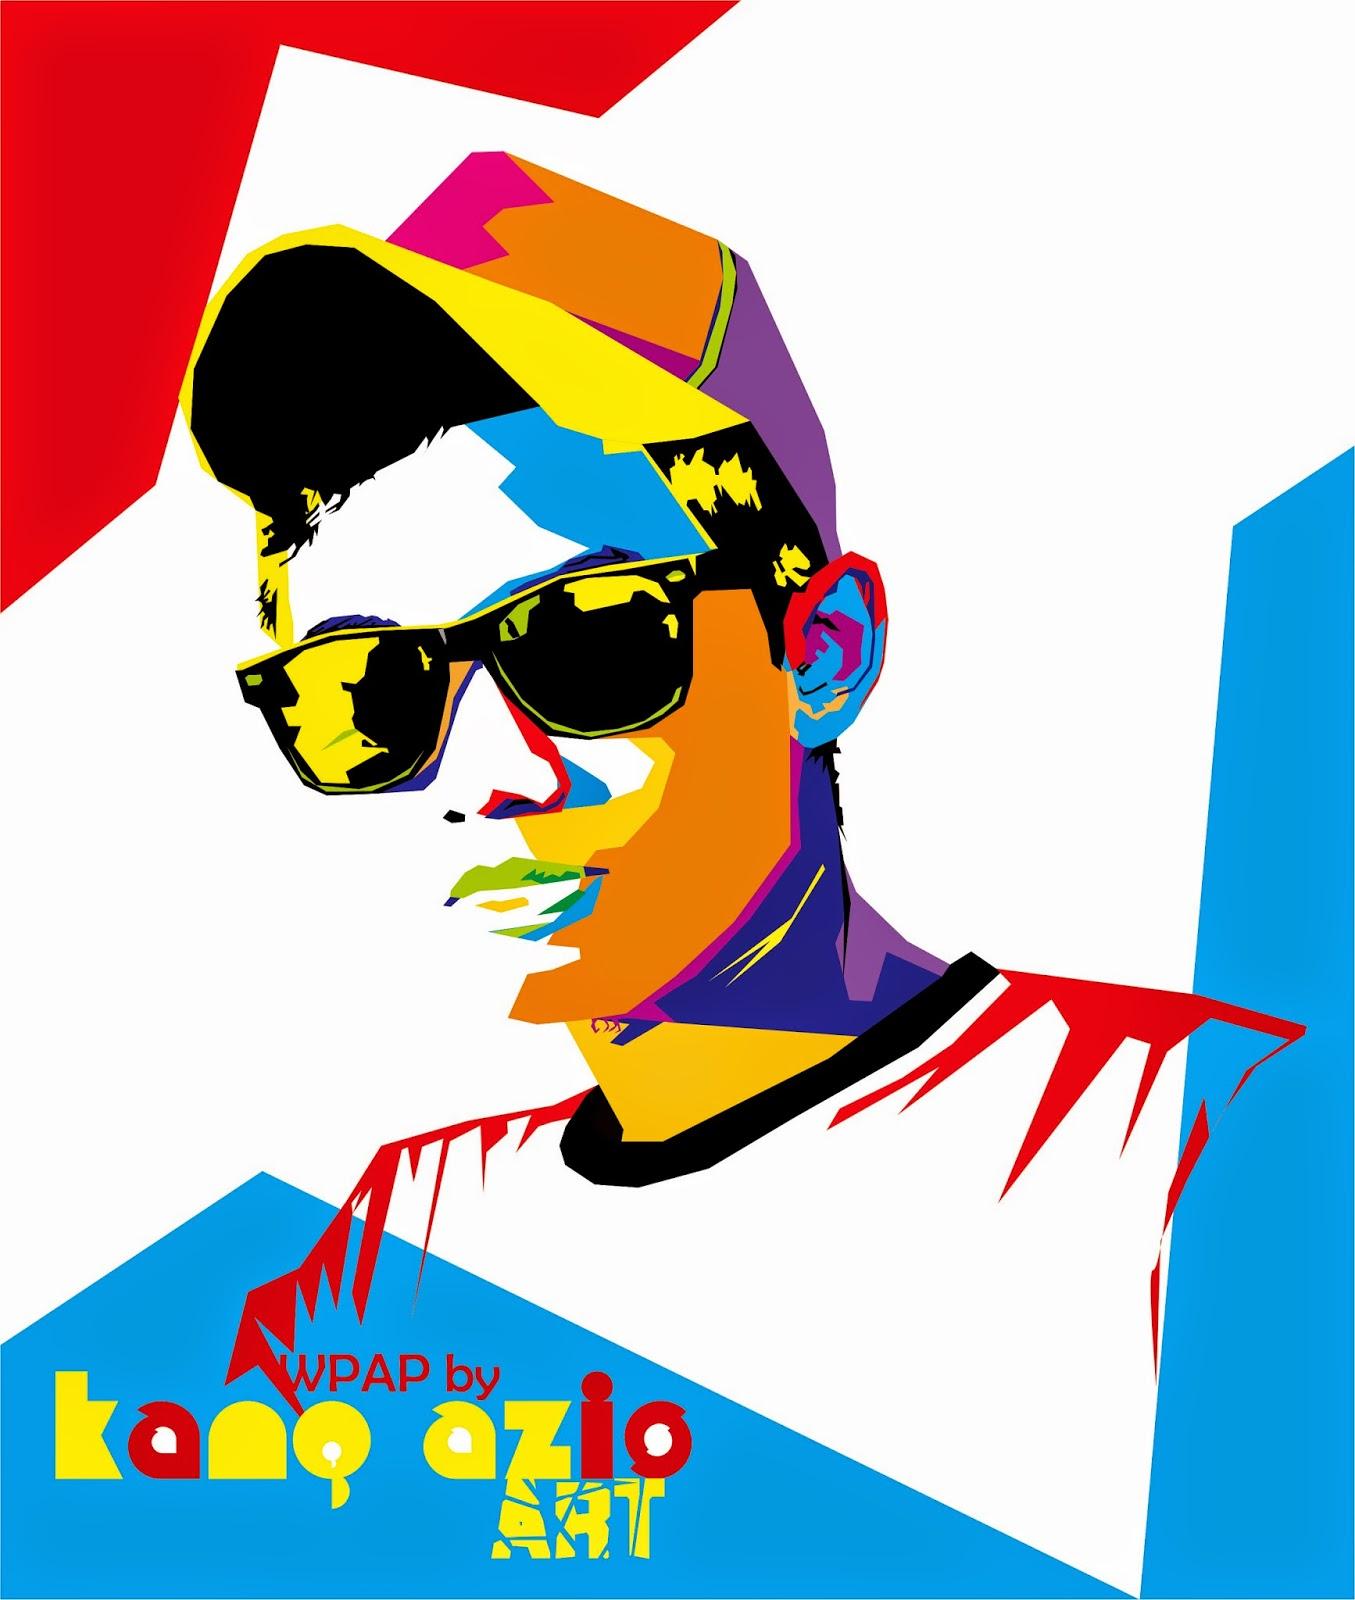 Sekilas Tentang WPAP (Wedha's Pop Art Portrait)